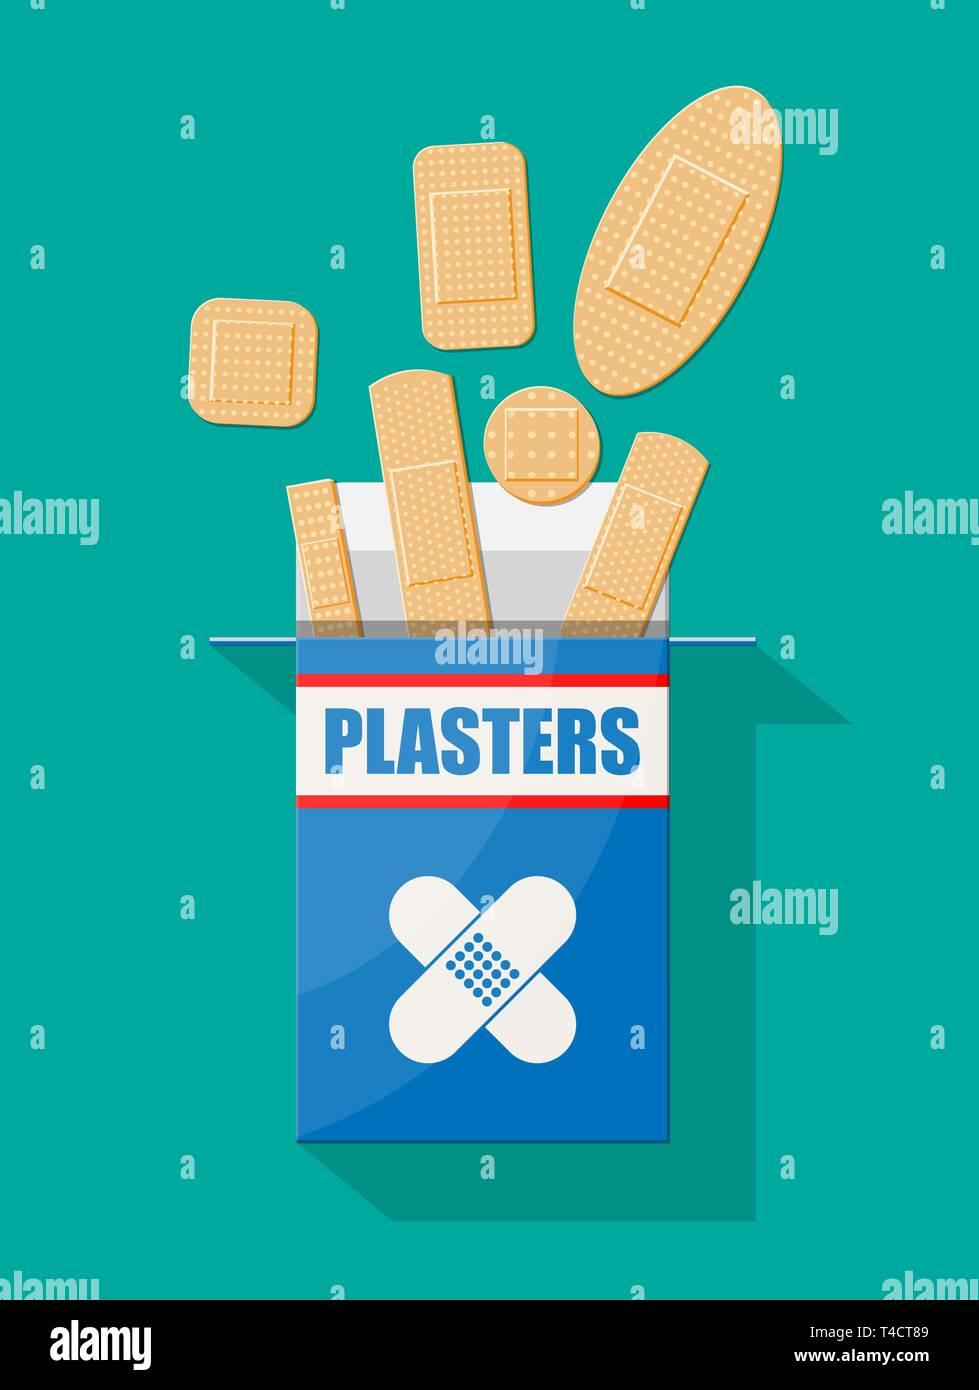 Plasters Box Stock Photos & Plasters Box Stock Images - Alamy